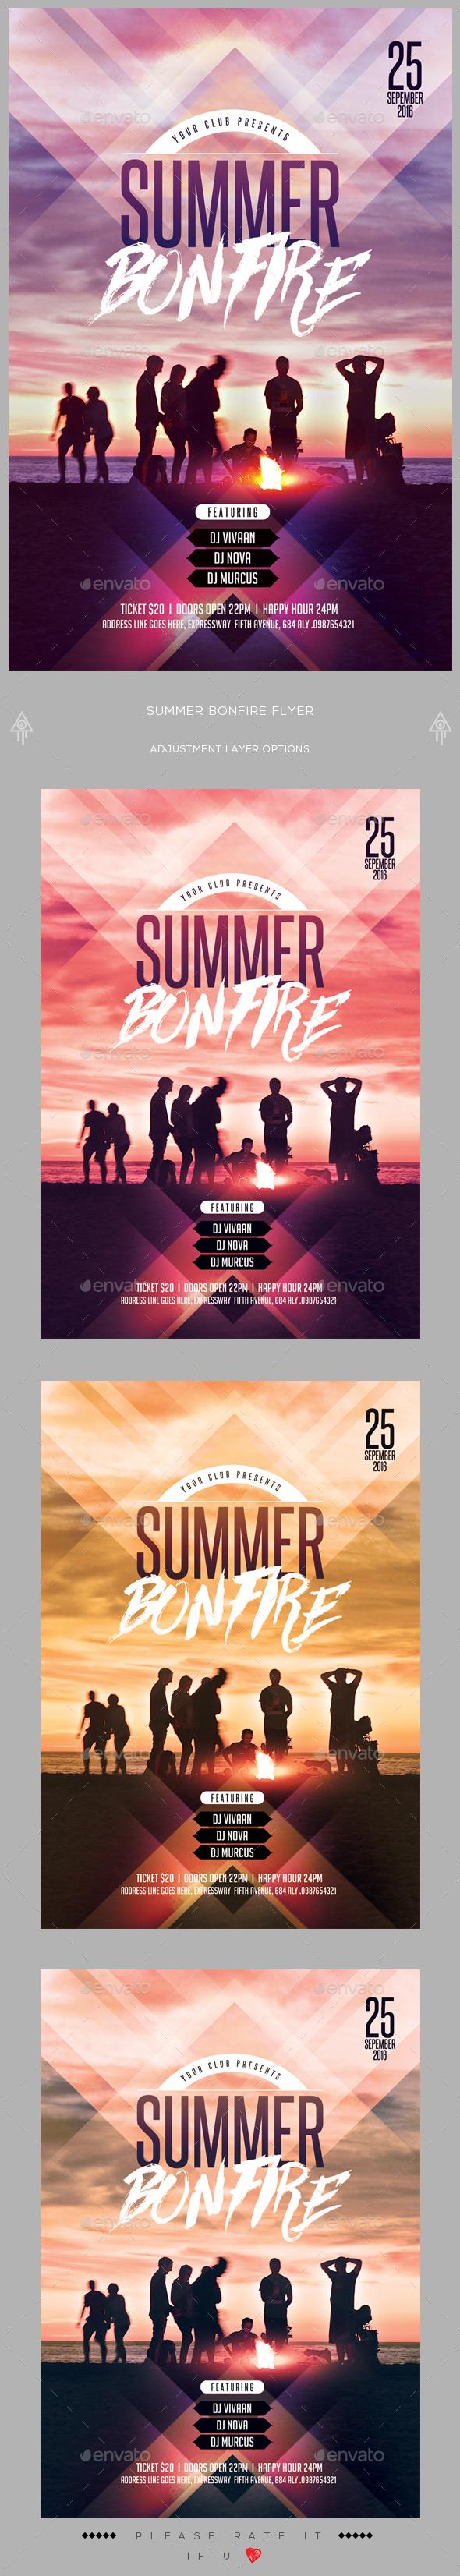 Summer Bonfire Flyer